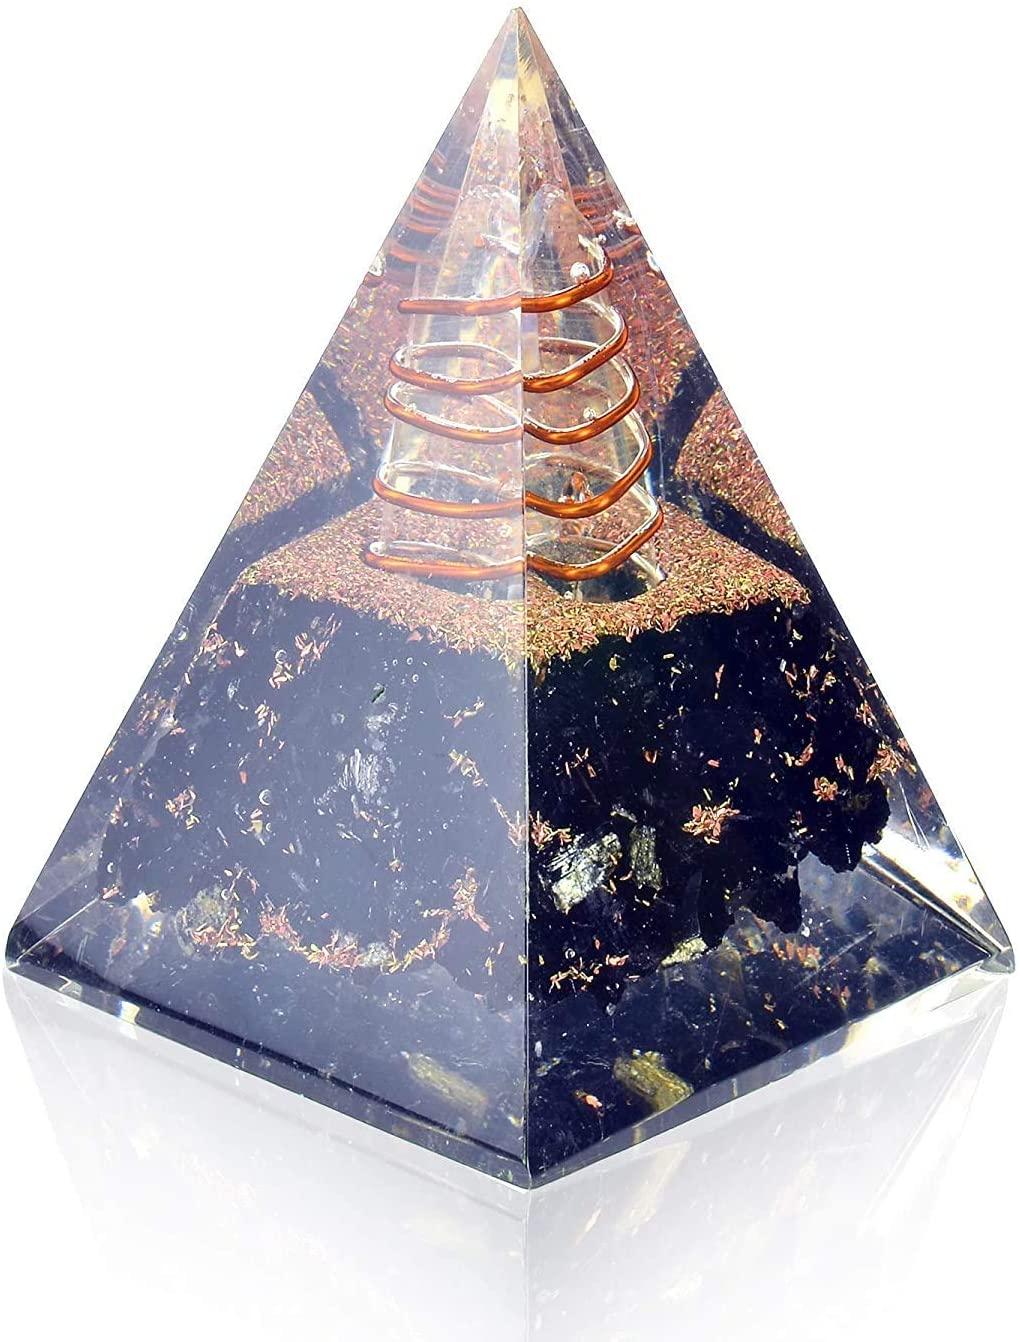 e-Click Black Tourmaline Energy Generator Crystal-Chakra Balancing Orgone Crystal Nubian Orgonite Pyramid Reiki Pyramid/Energy Points/EMF Protection Meditation Yoga Energy Generator